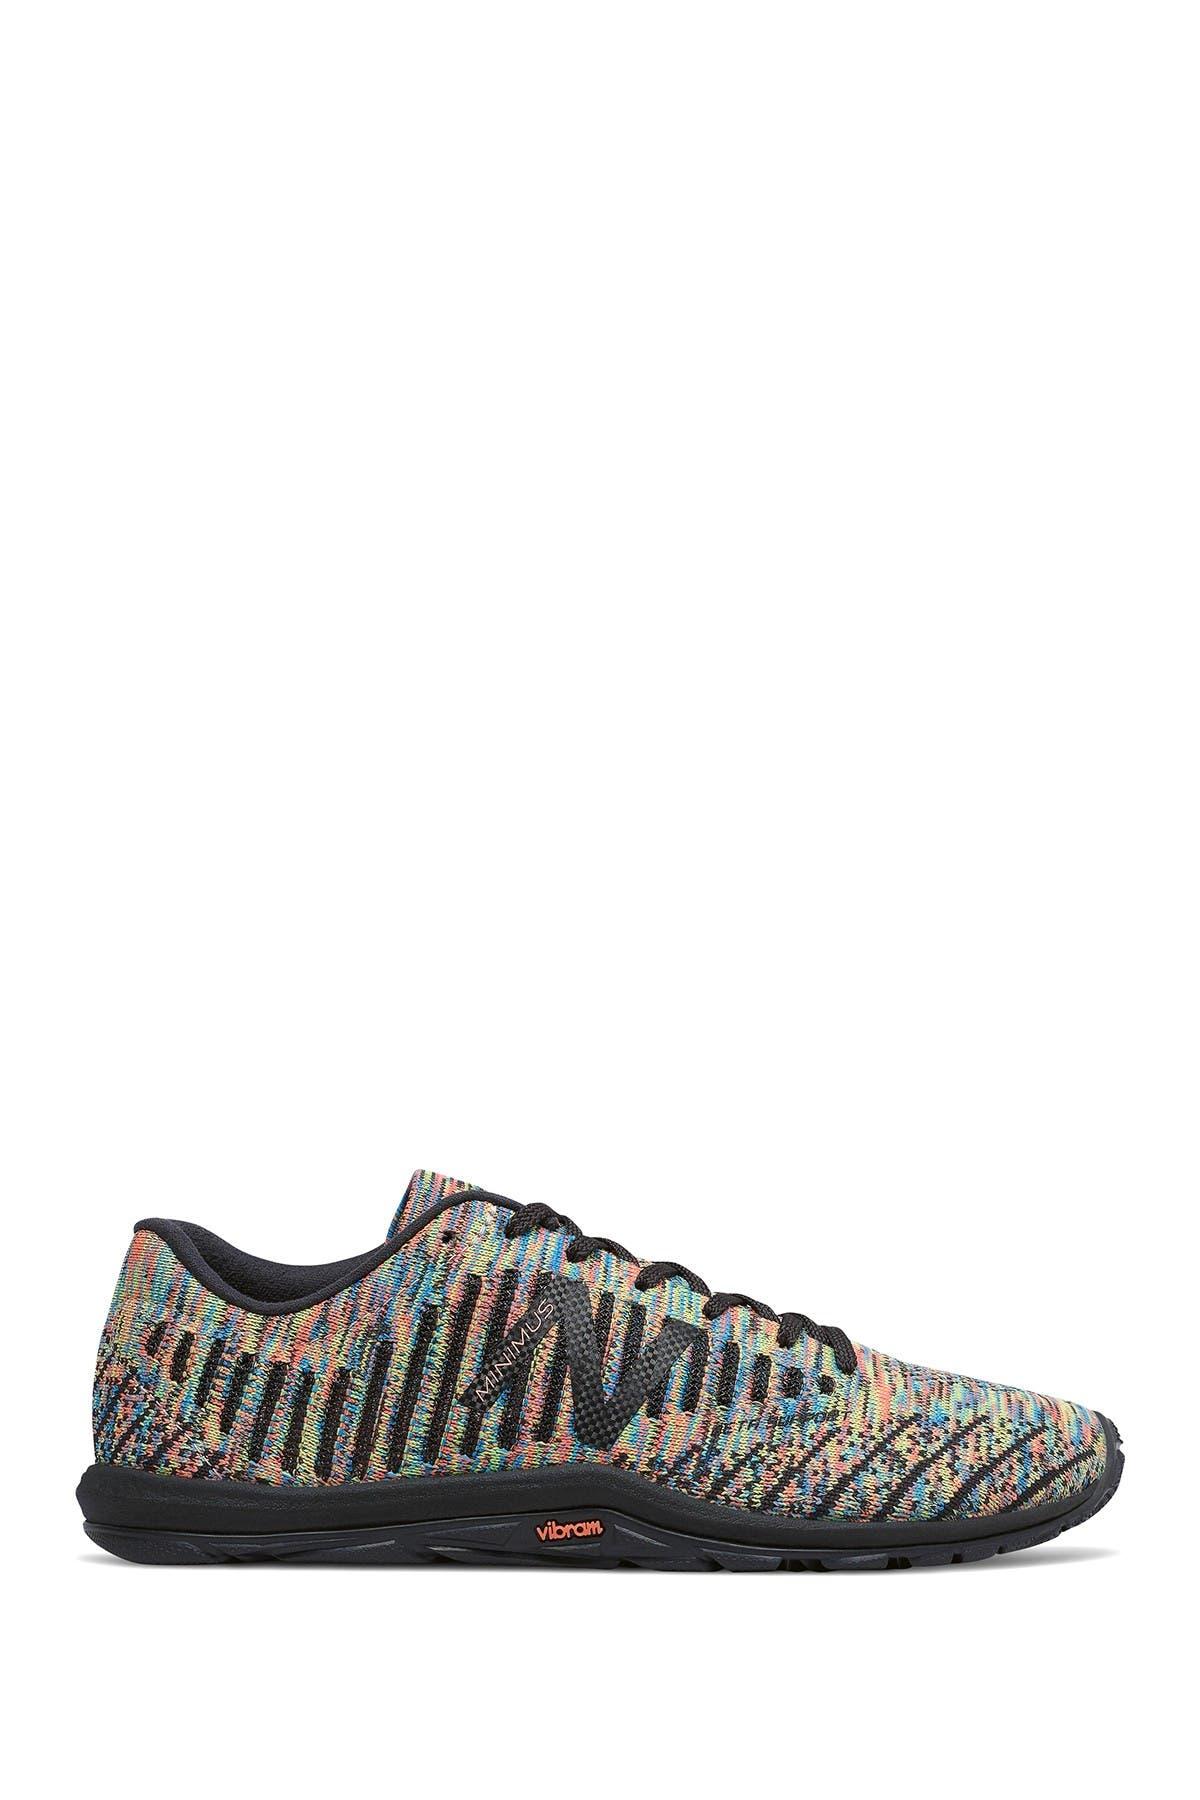 Image of New Balance Minimus 20v7 Sneaker